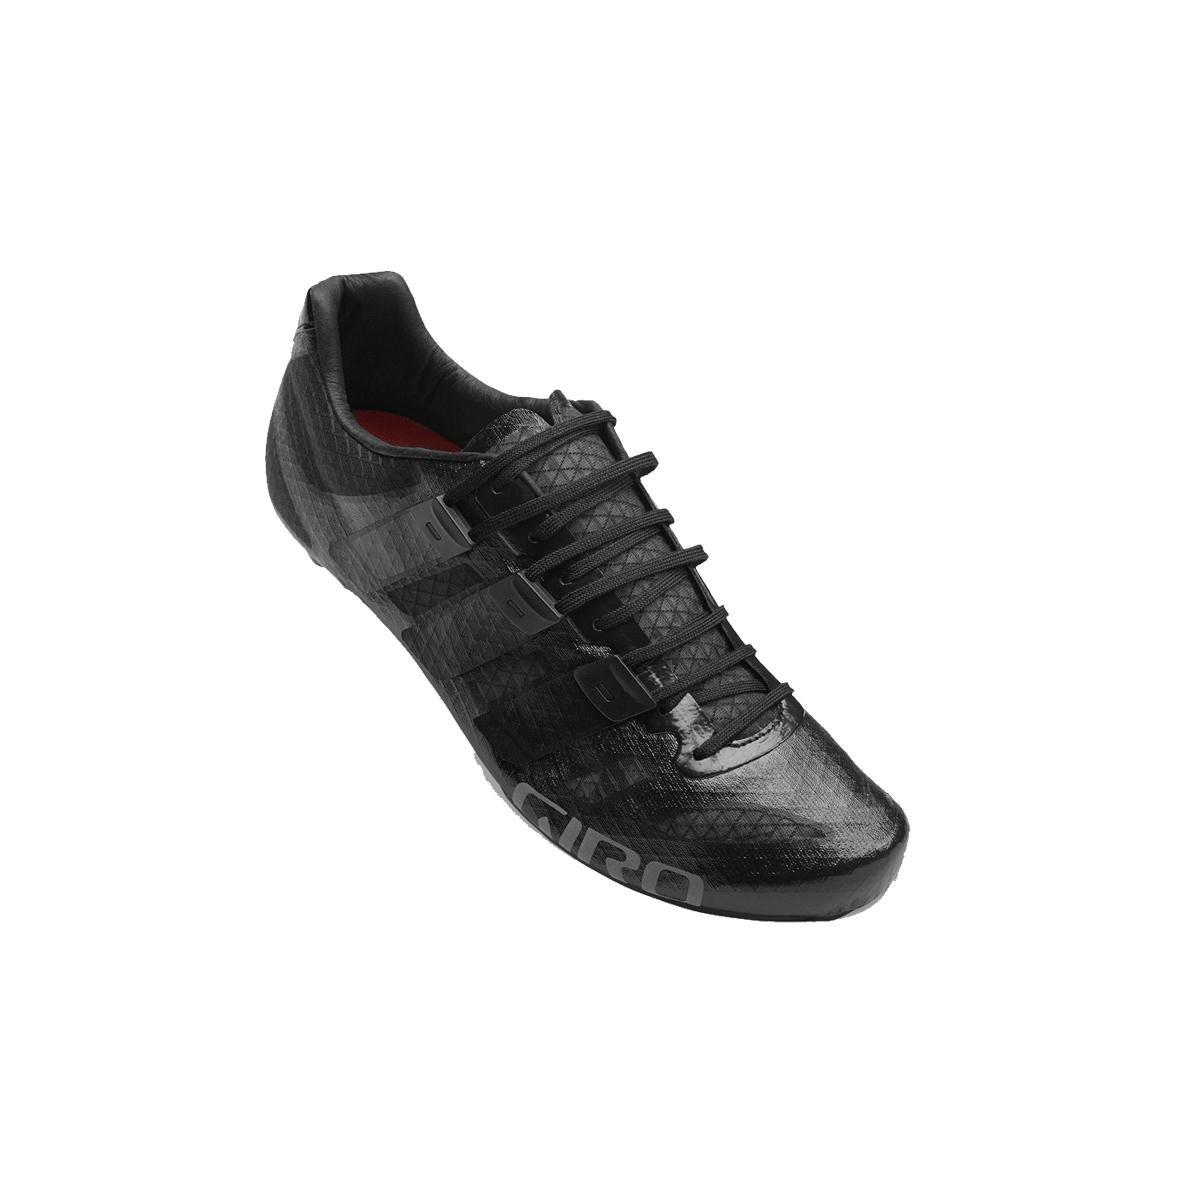 Giro Prolight Techlace サイクリングシューズ メンズ B073YBD8BS 48|ブラック ブラック 48